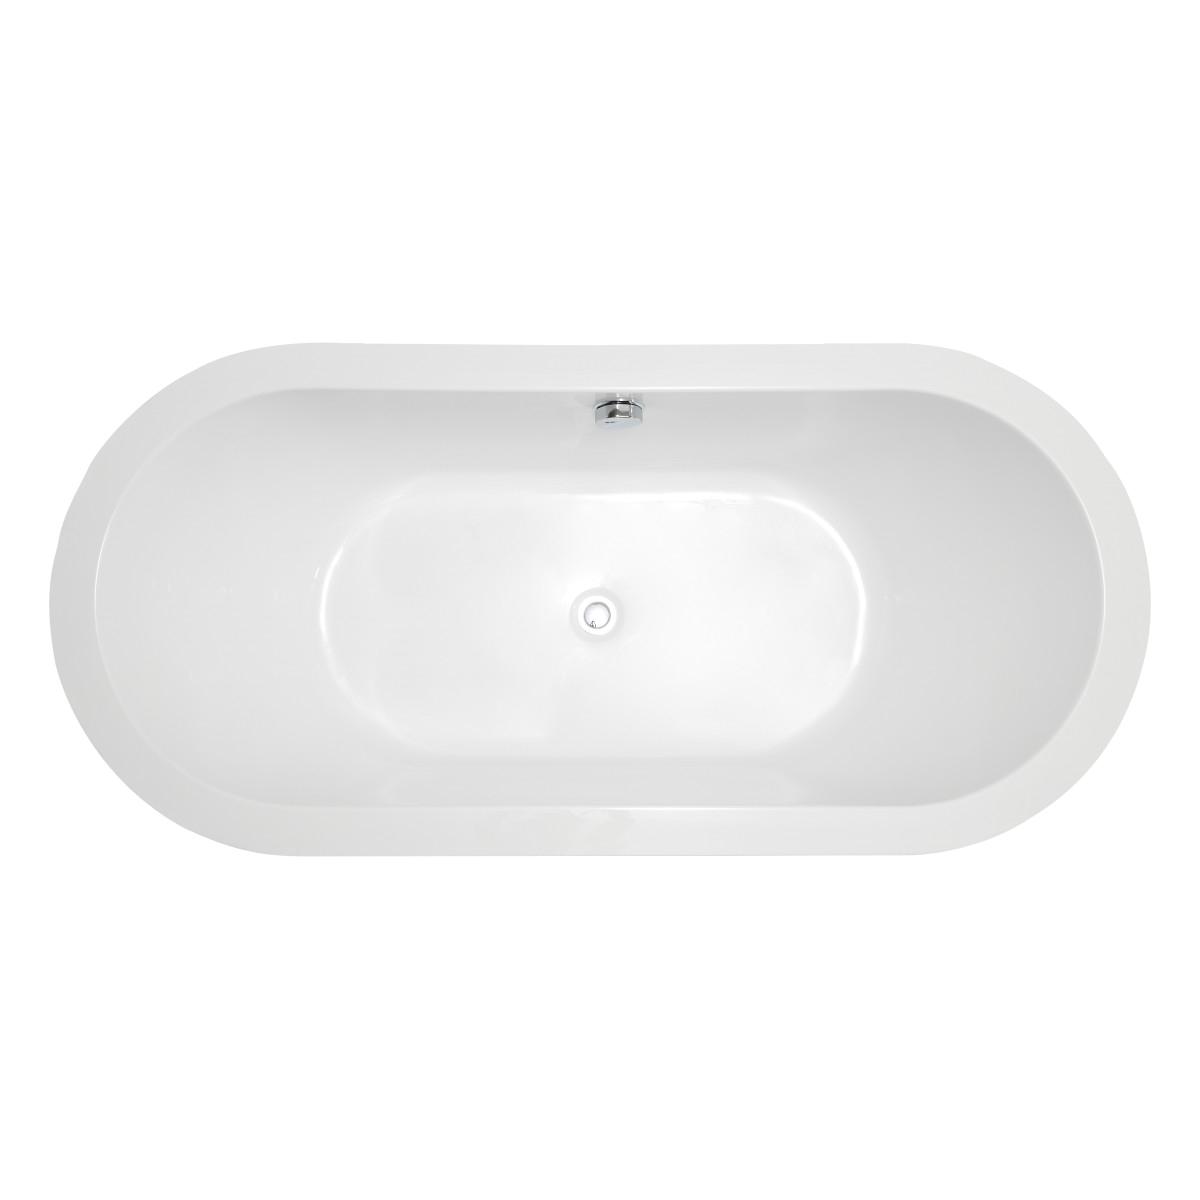 1600mm Freestanding Bathtub Freestanding Bath Royce Oval 1600mm